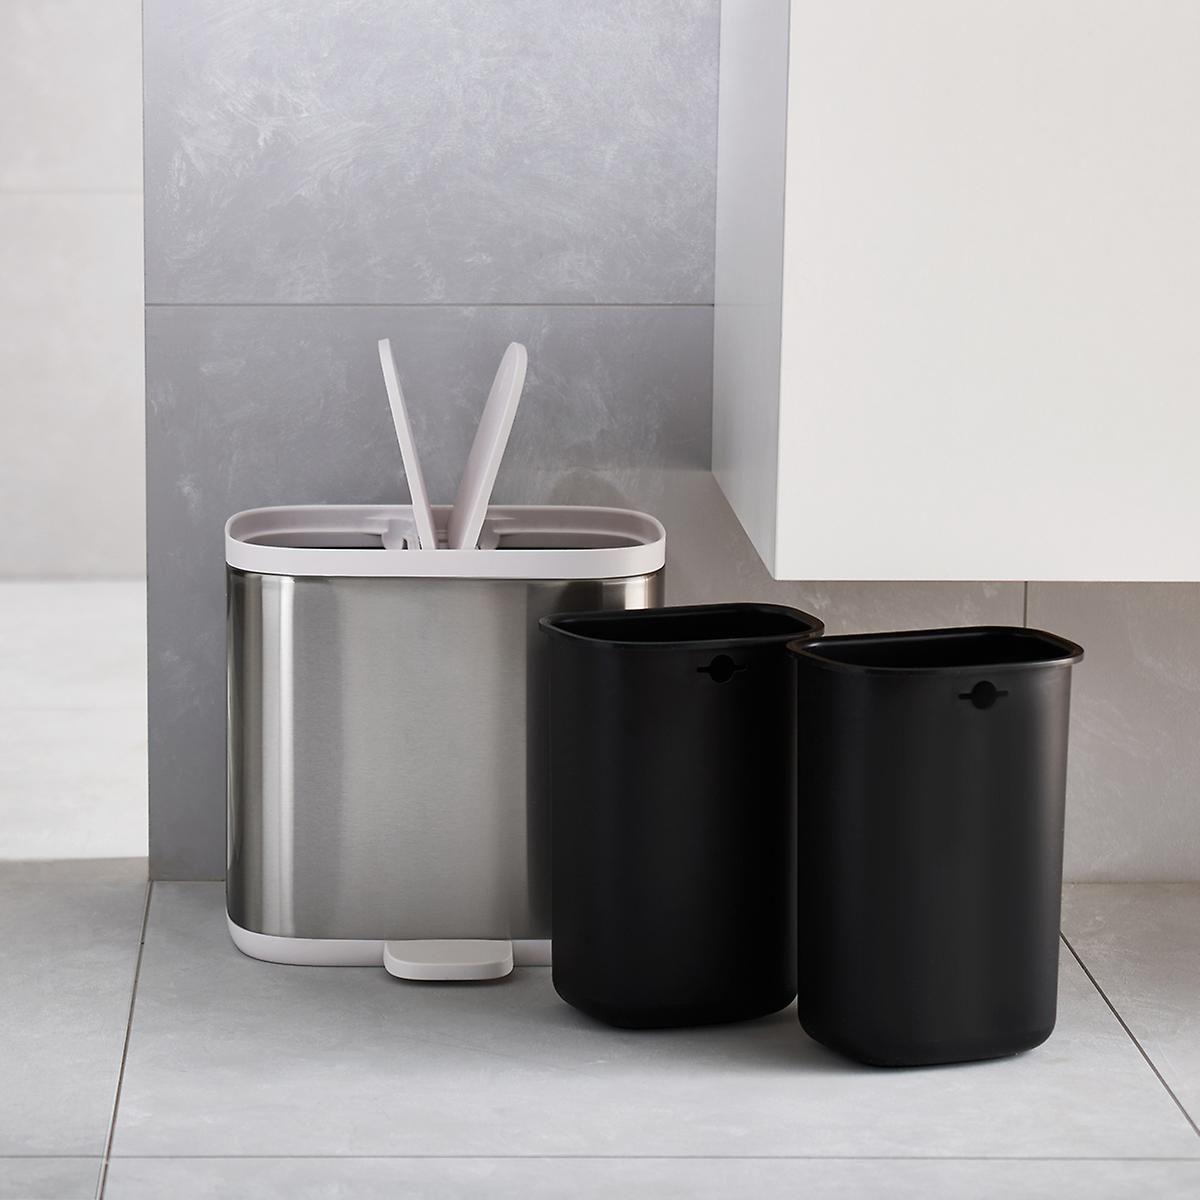 Joseph Joseph Split Recycler Trash Can Trash Can Kitchen Trash Cans Bathroom Bin